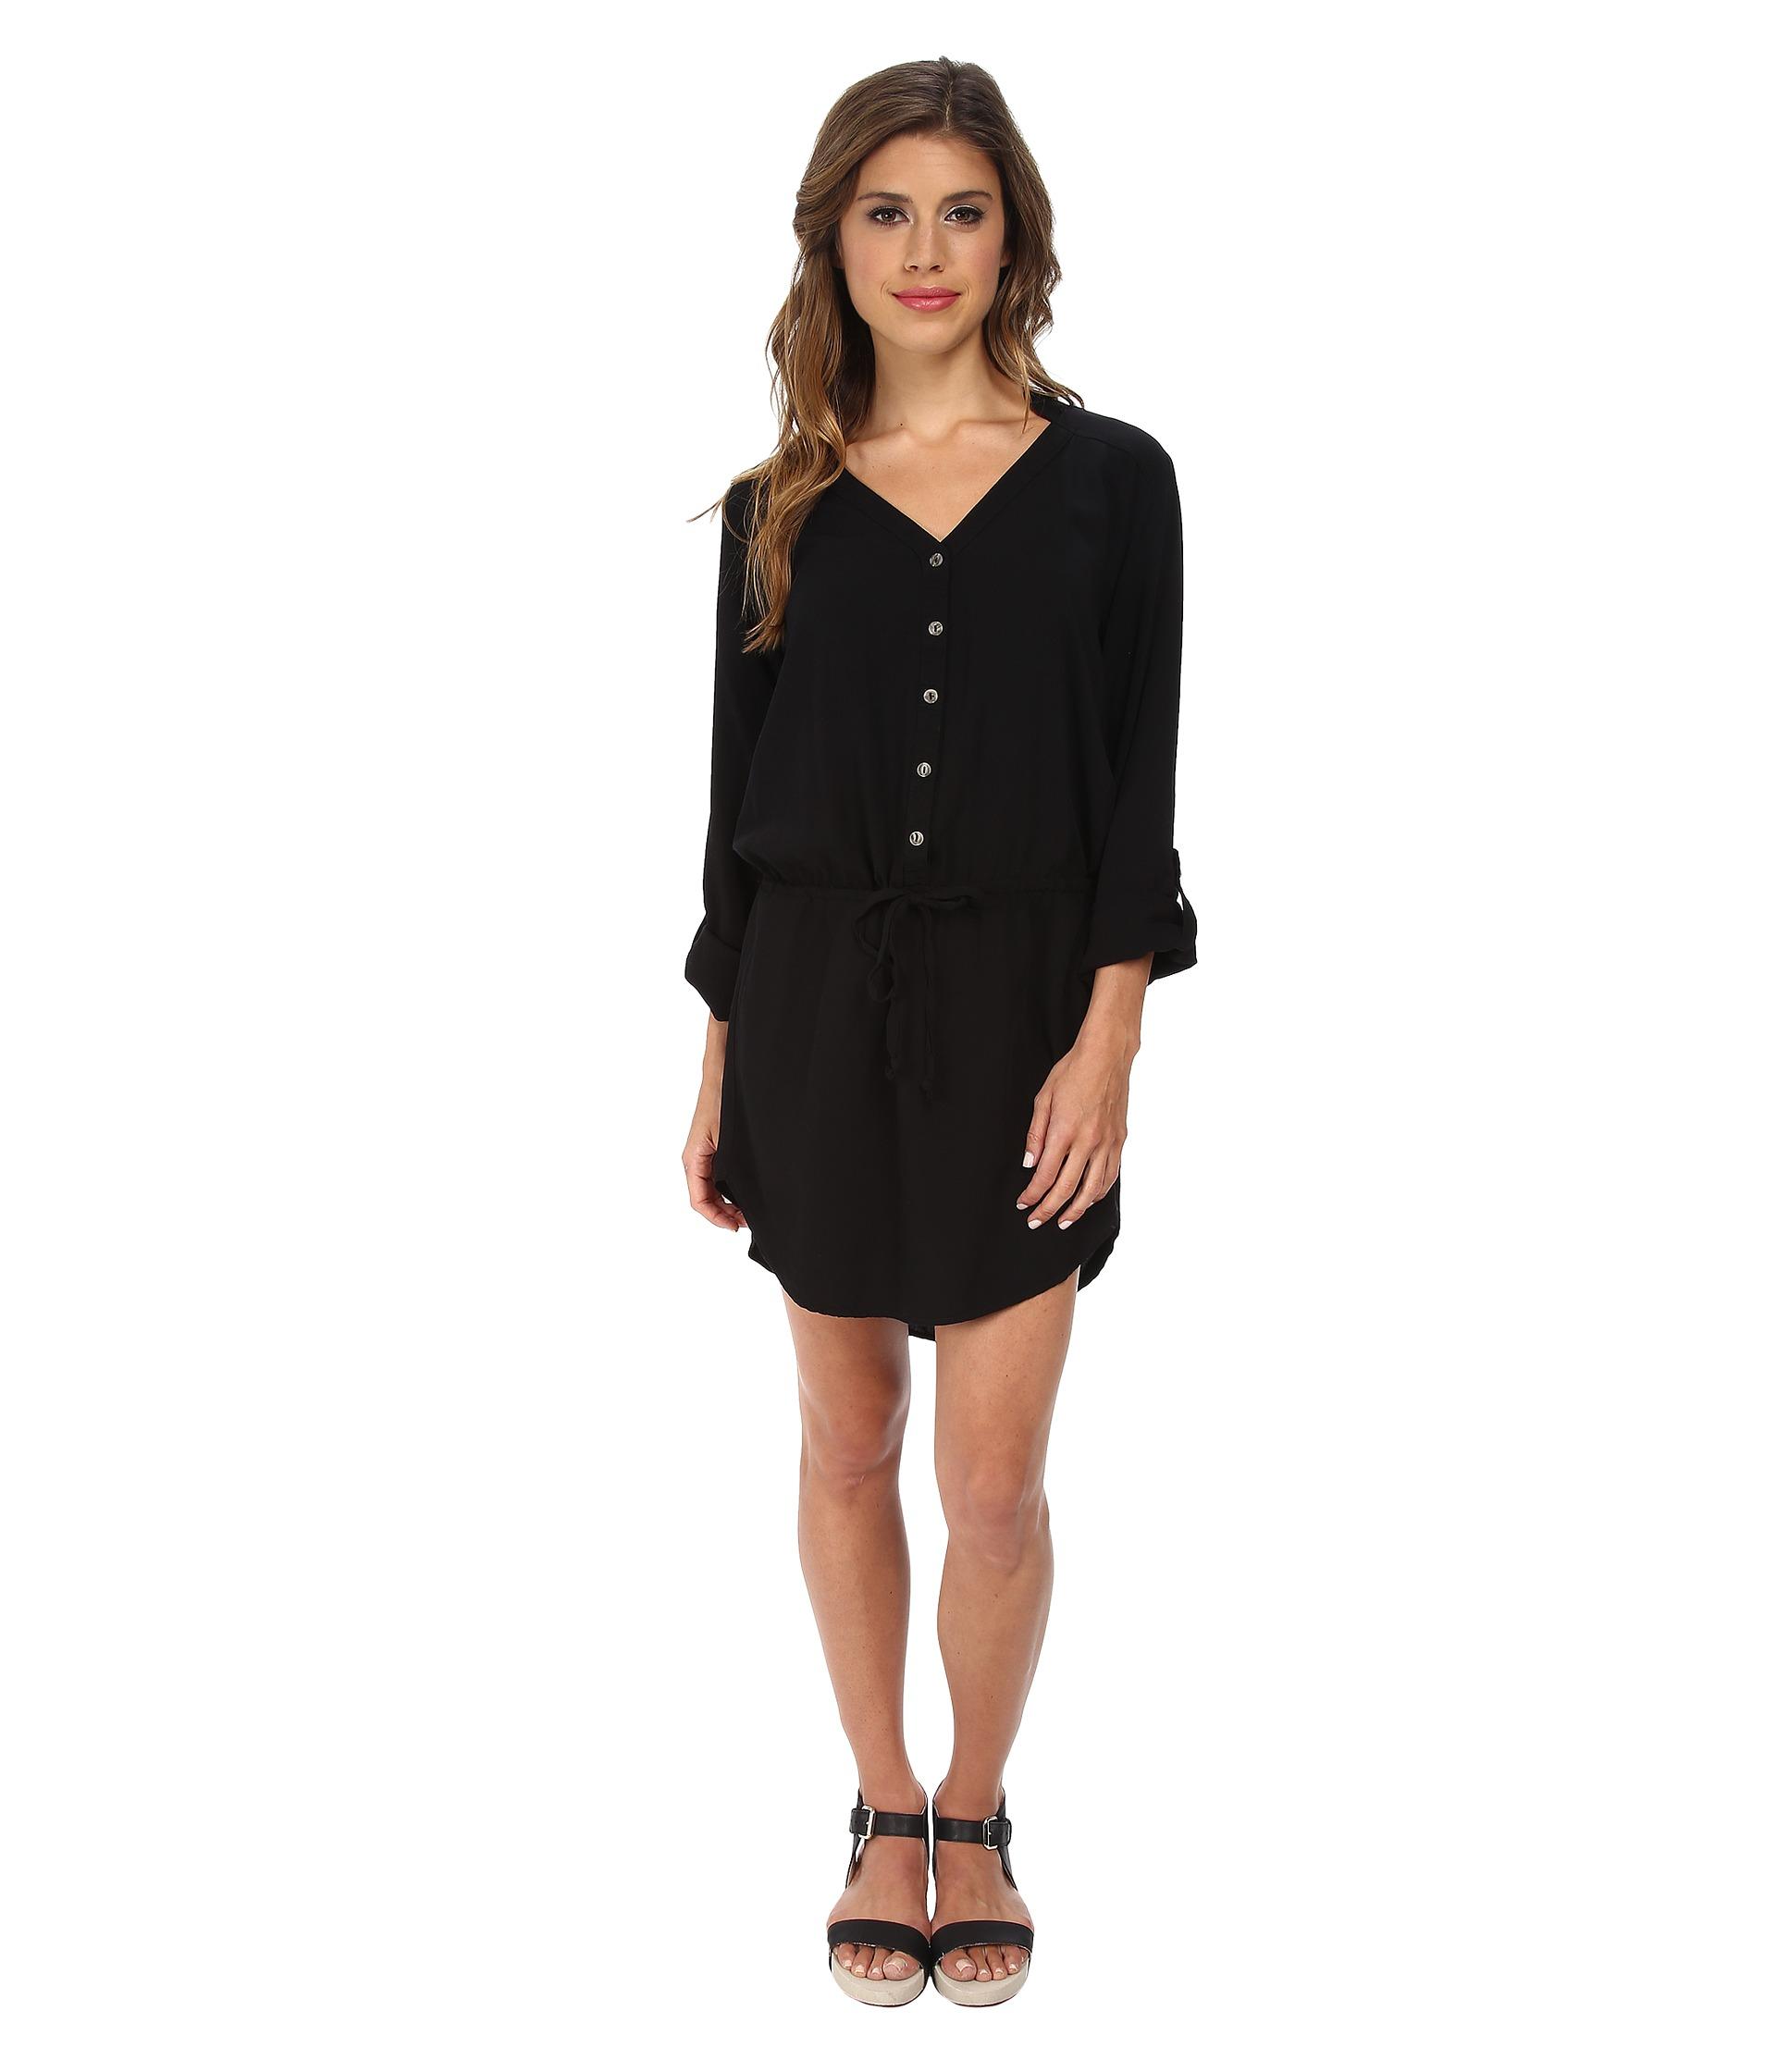 Long Sleeve Short Dresses